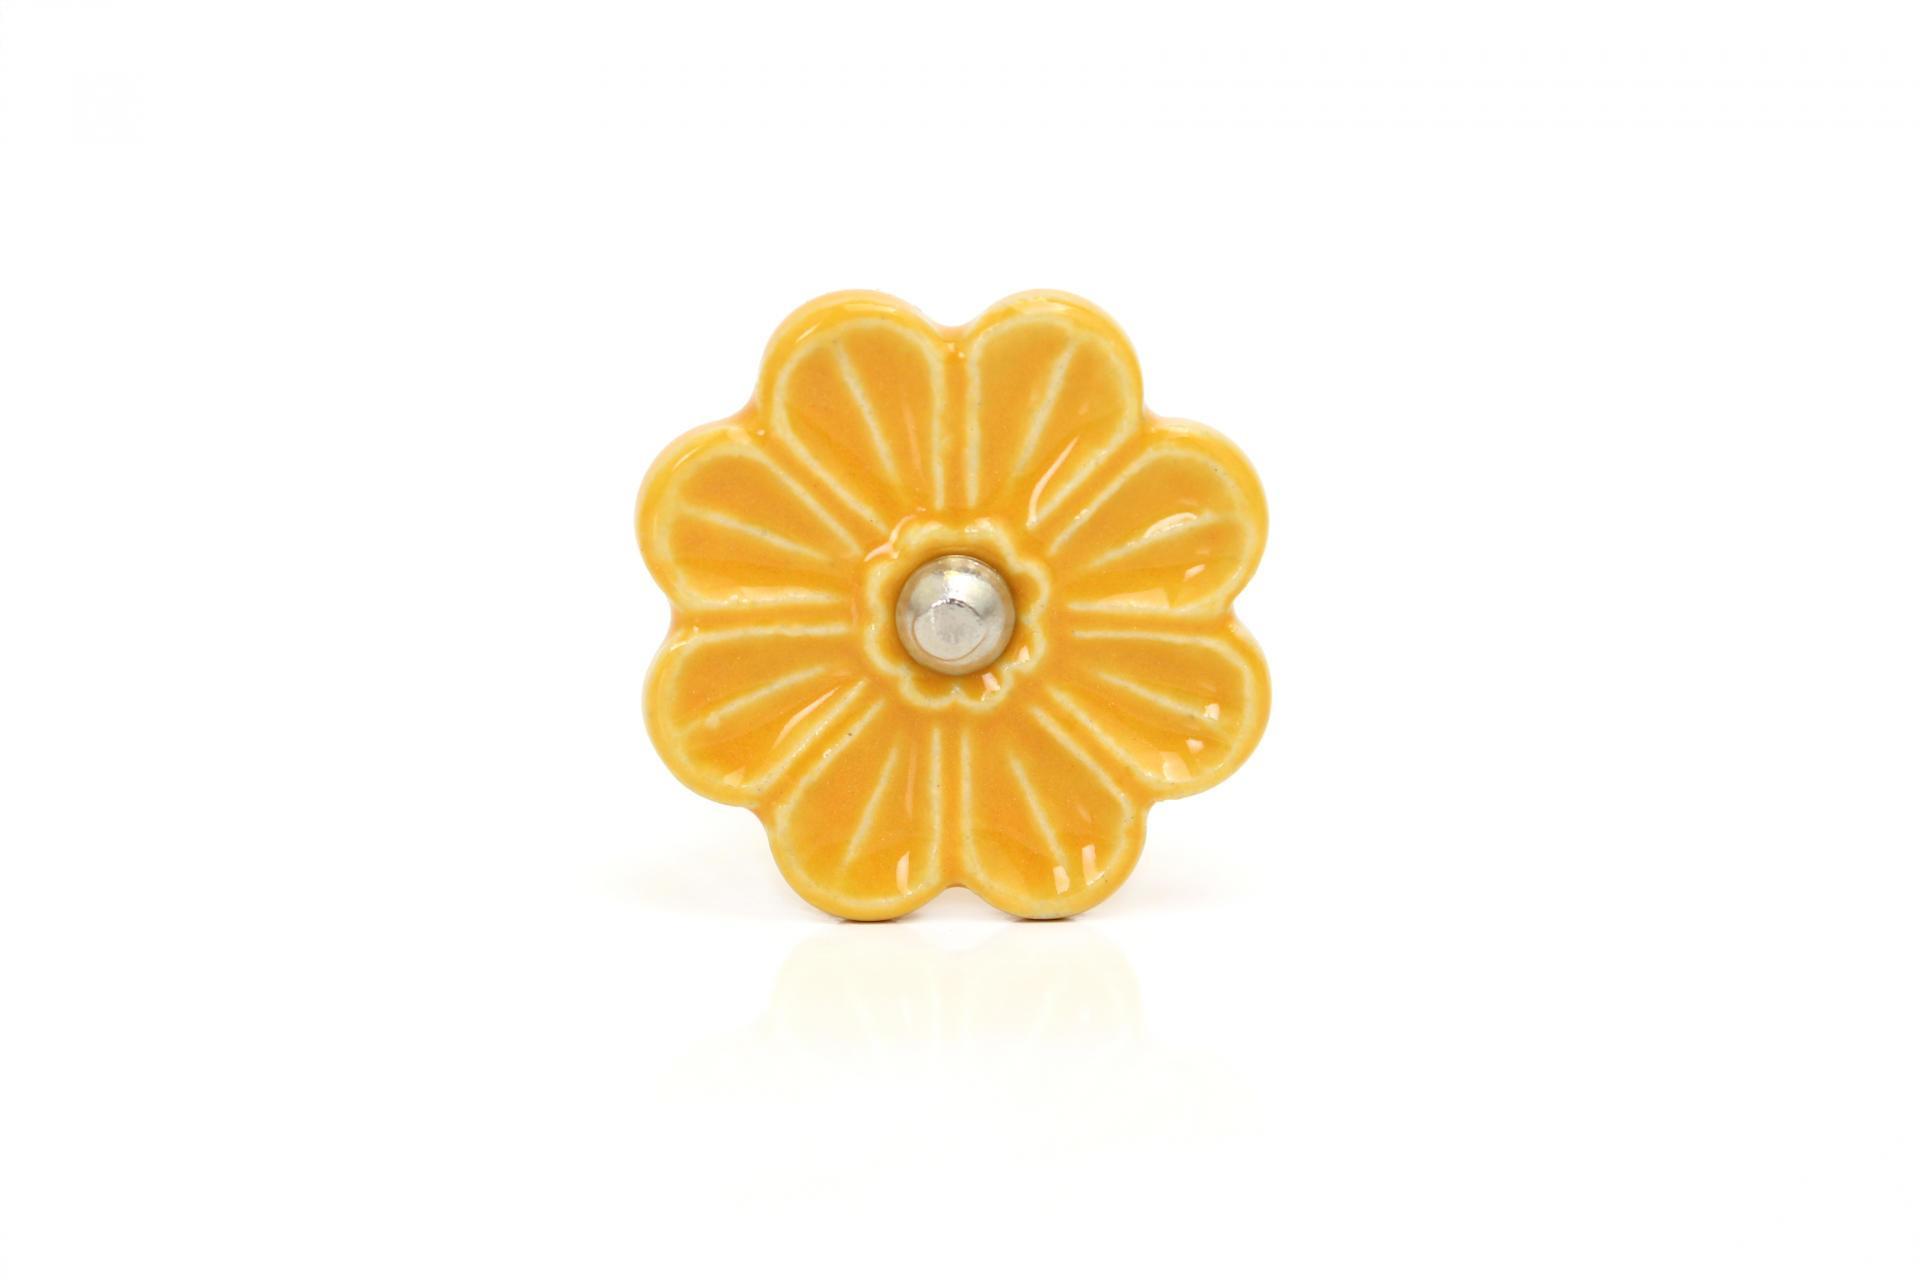 La finesse Porcelánová úchytka Flower yellow, žlutá barva, keramika 30 mm 40 mm